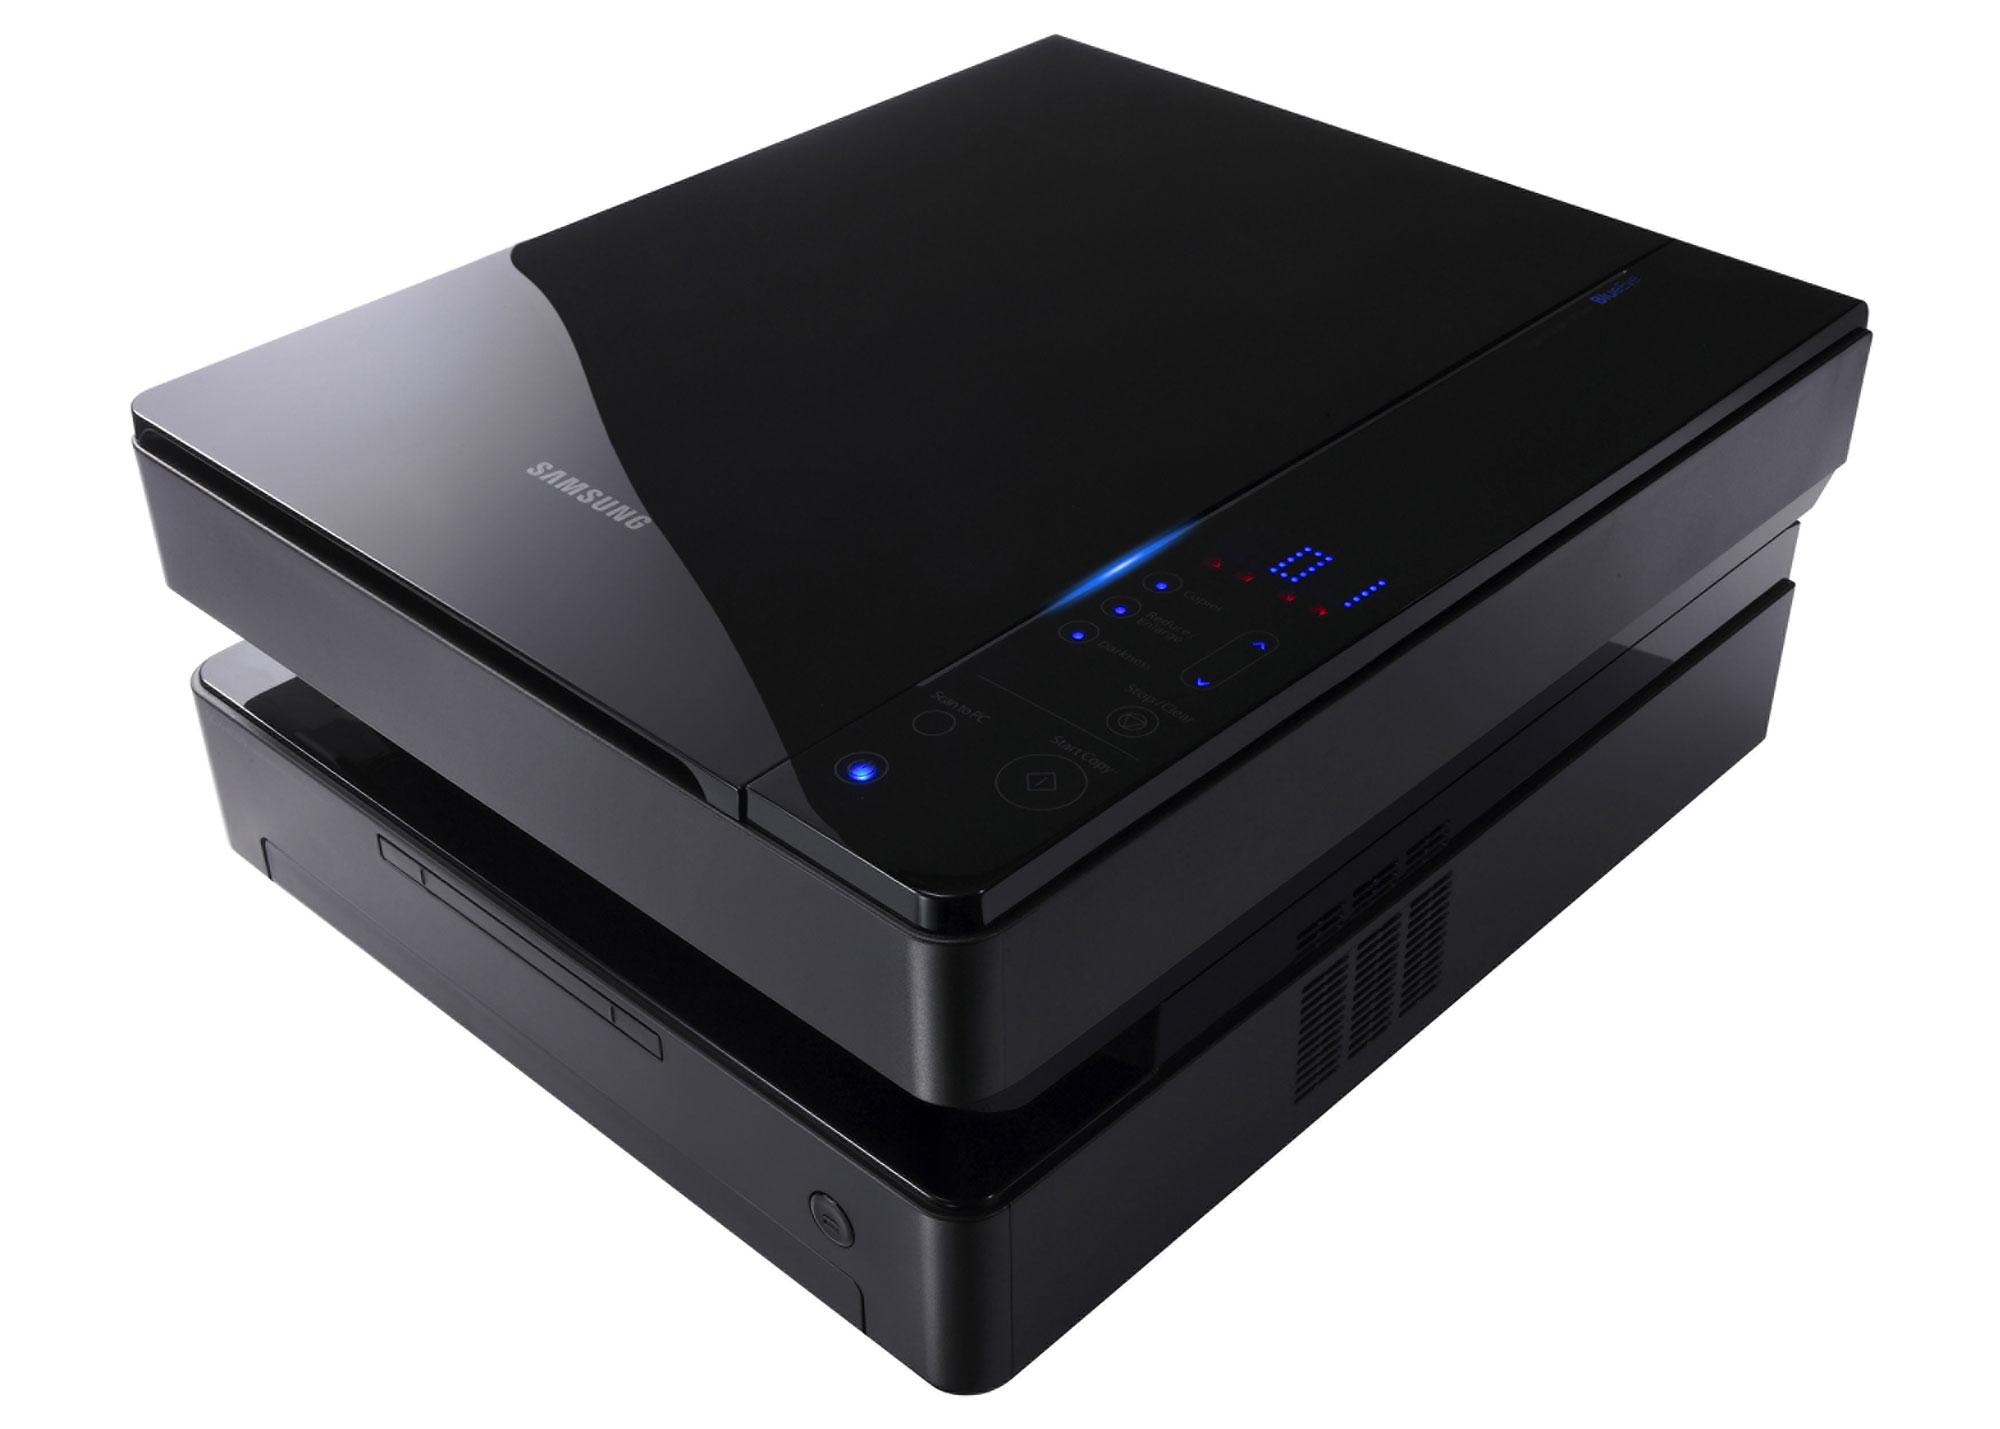 Принтер Samsung SCX-4500